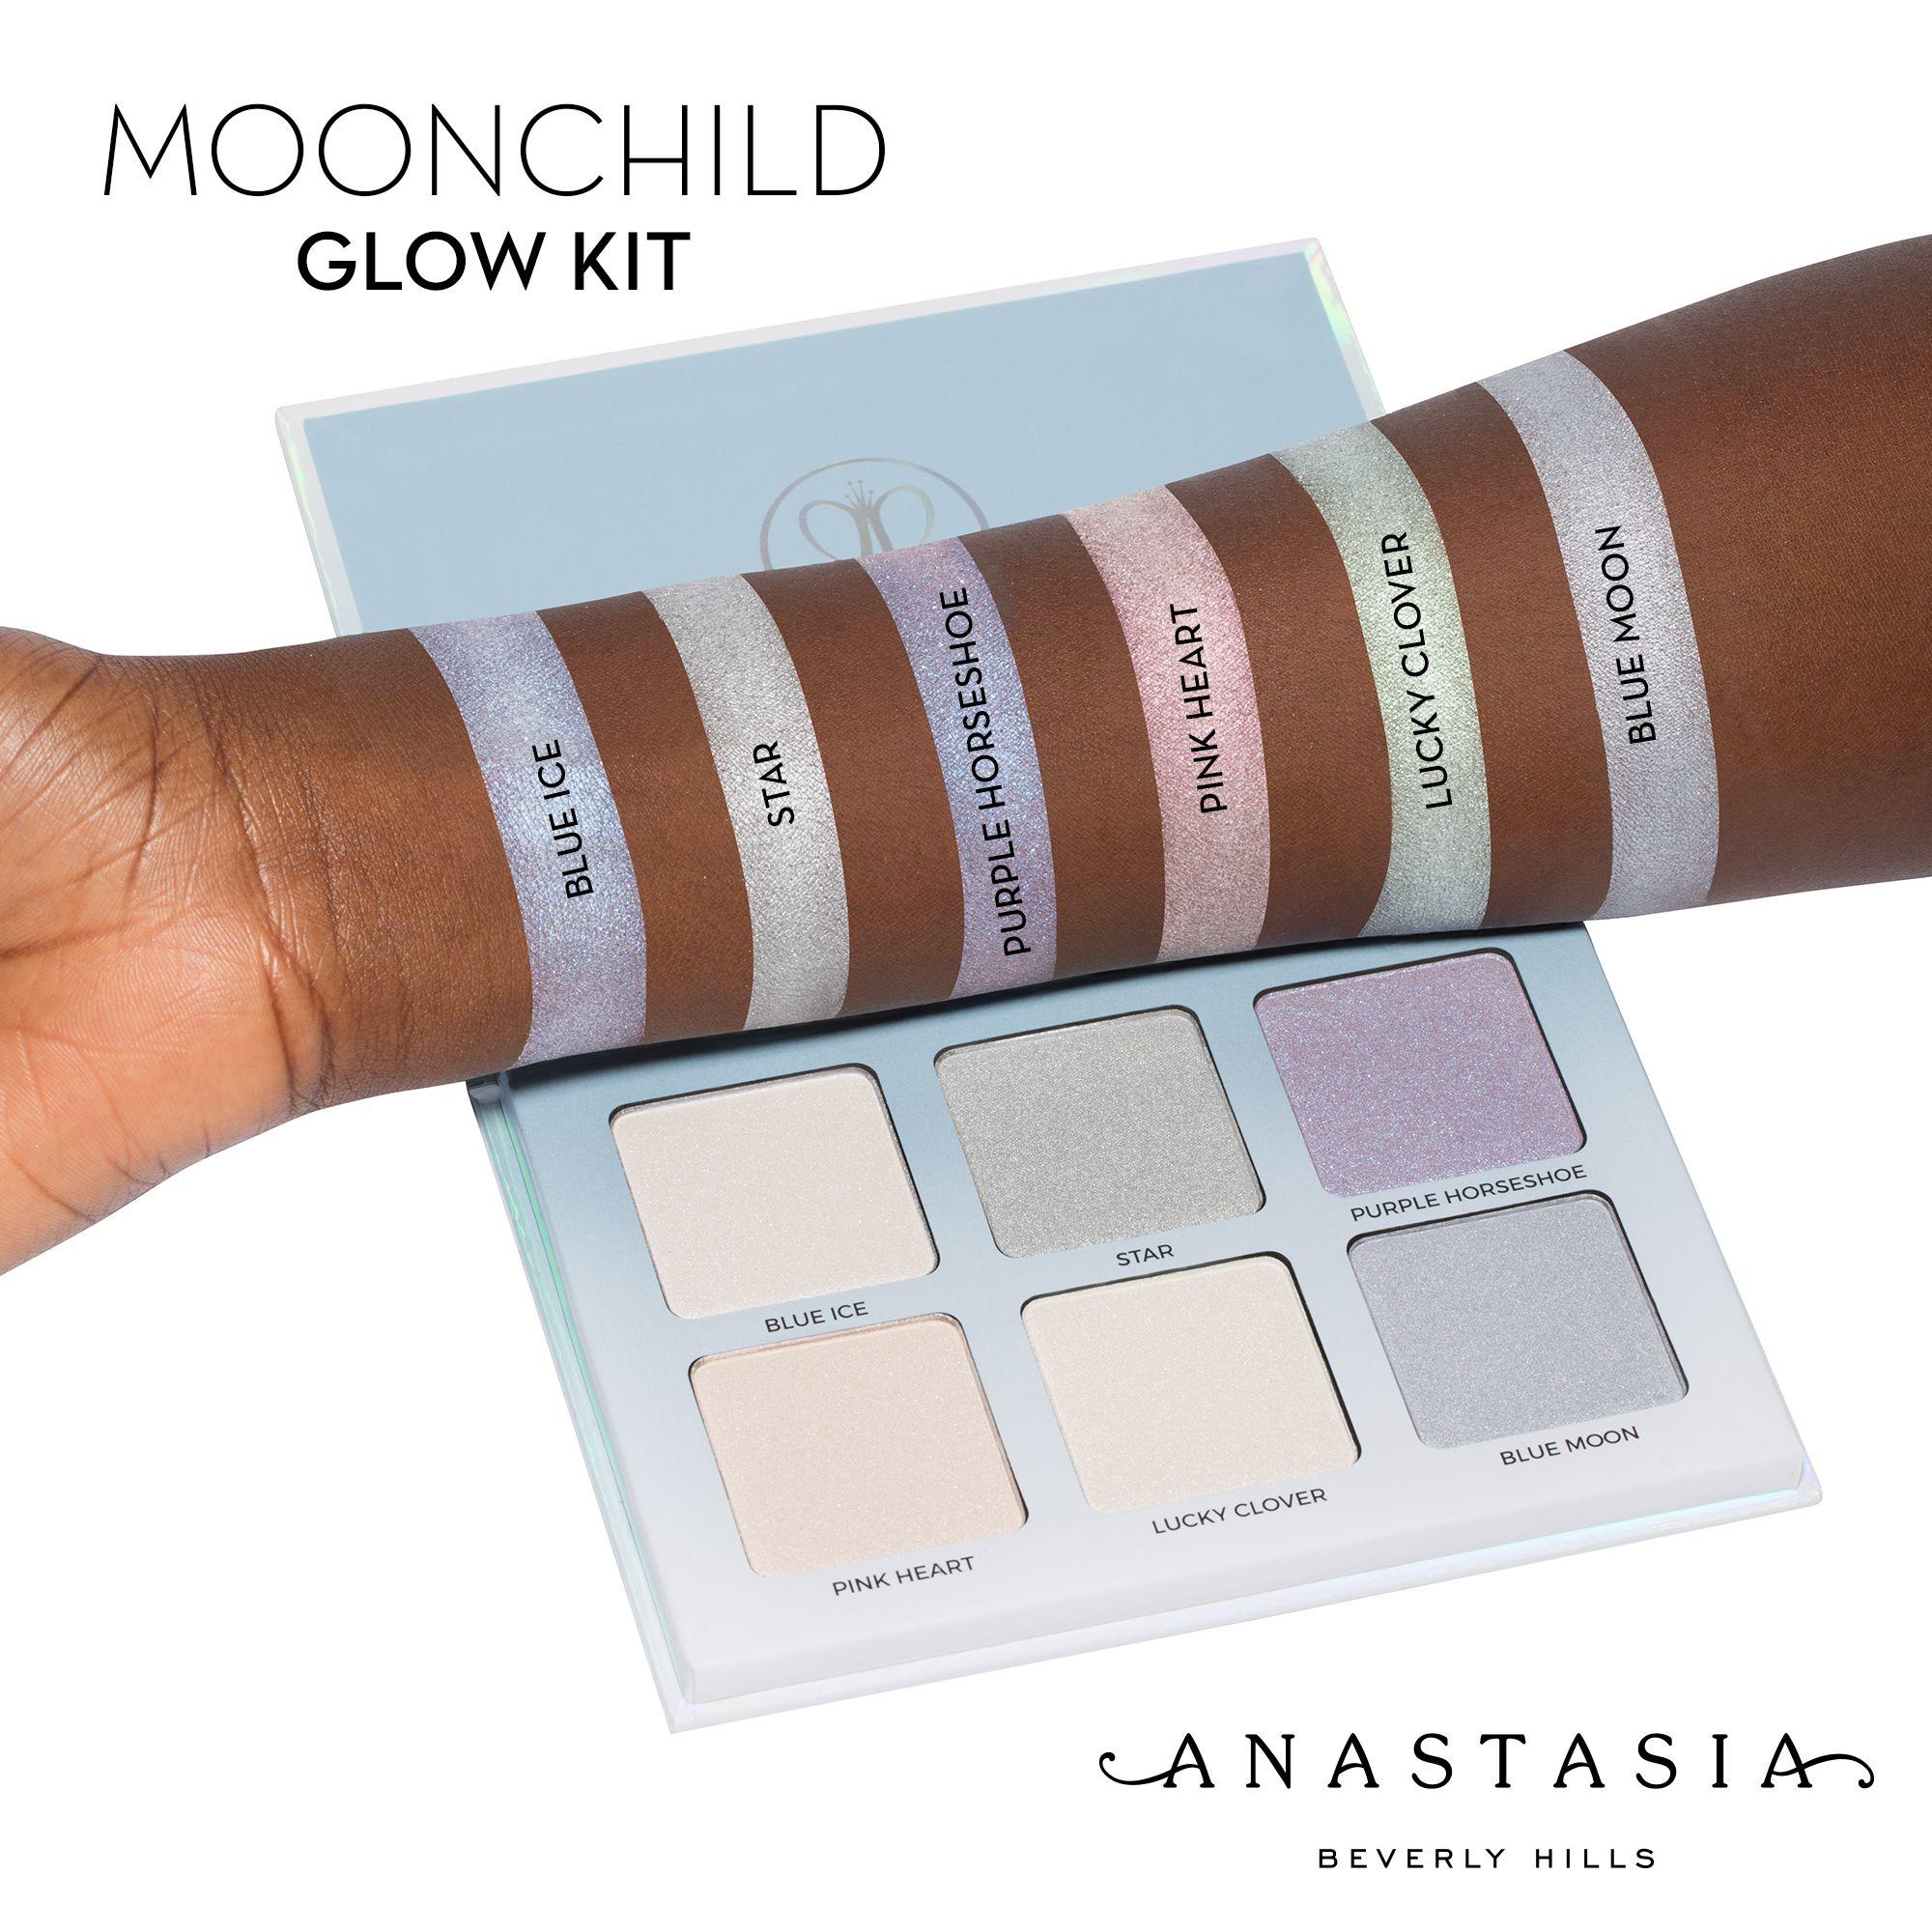 Glow Kit - Moonchild by Anastasia Beverly Hills #9